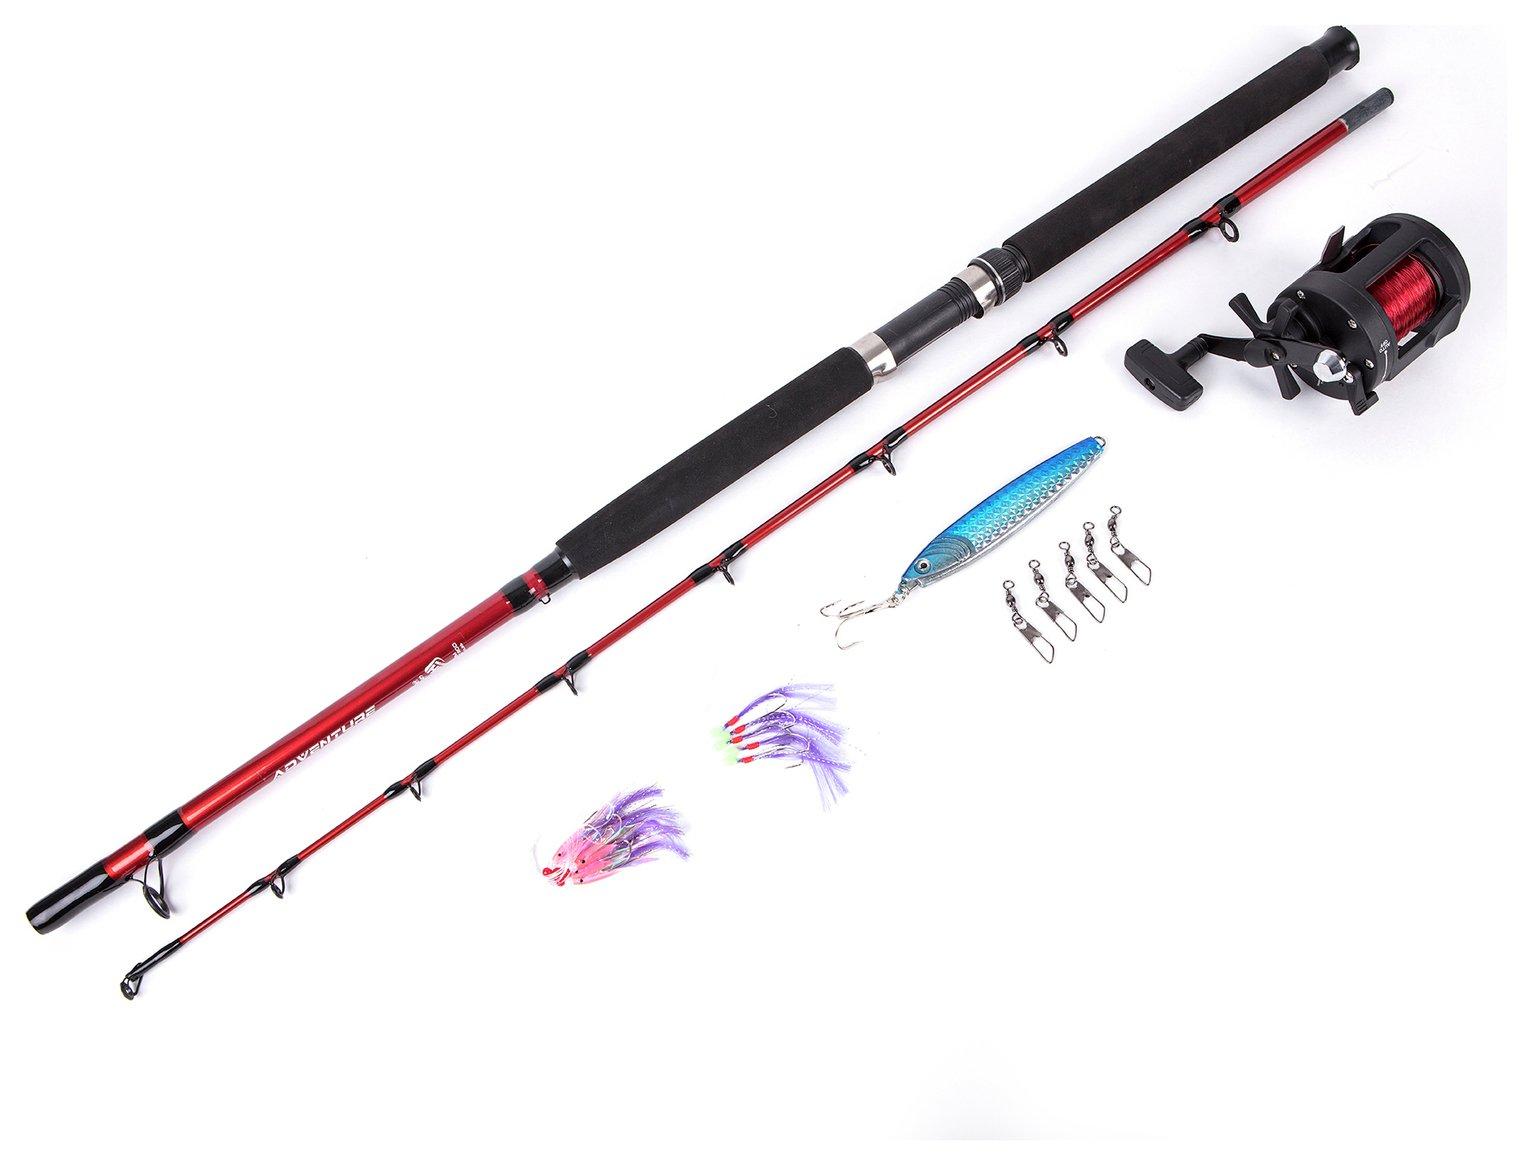 Matt Hayes Adventure Boat Fishing Rod, Reel & Accessories